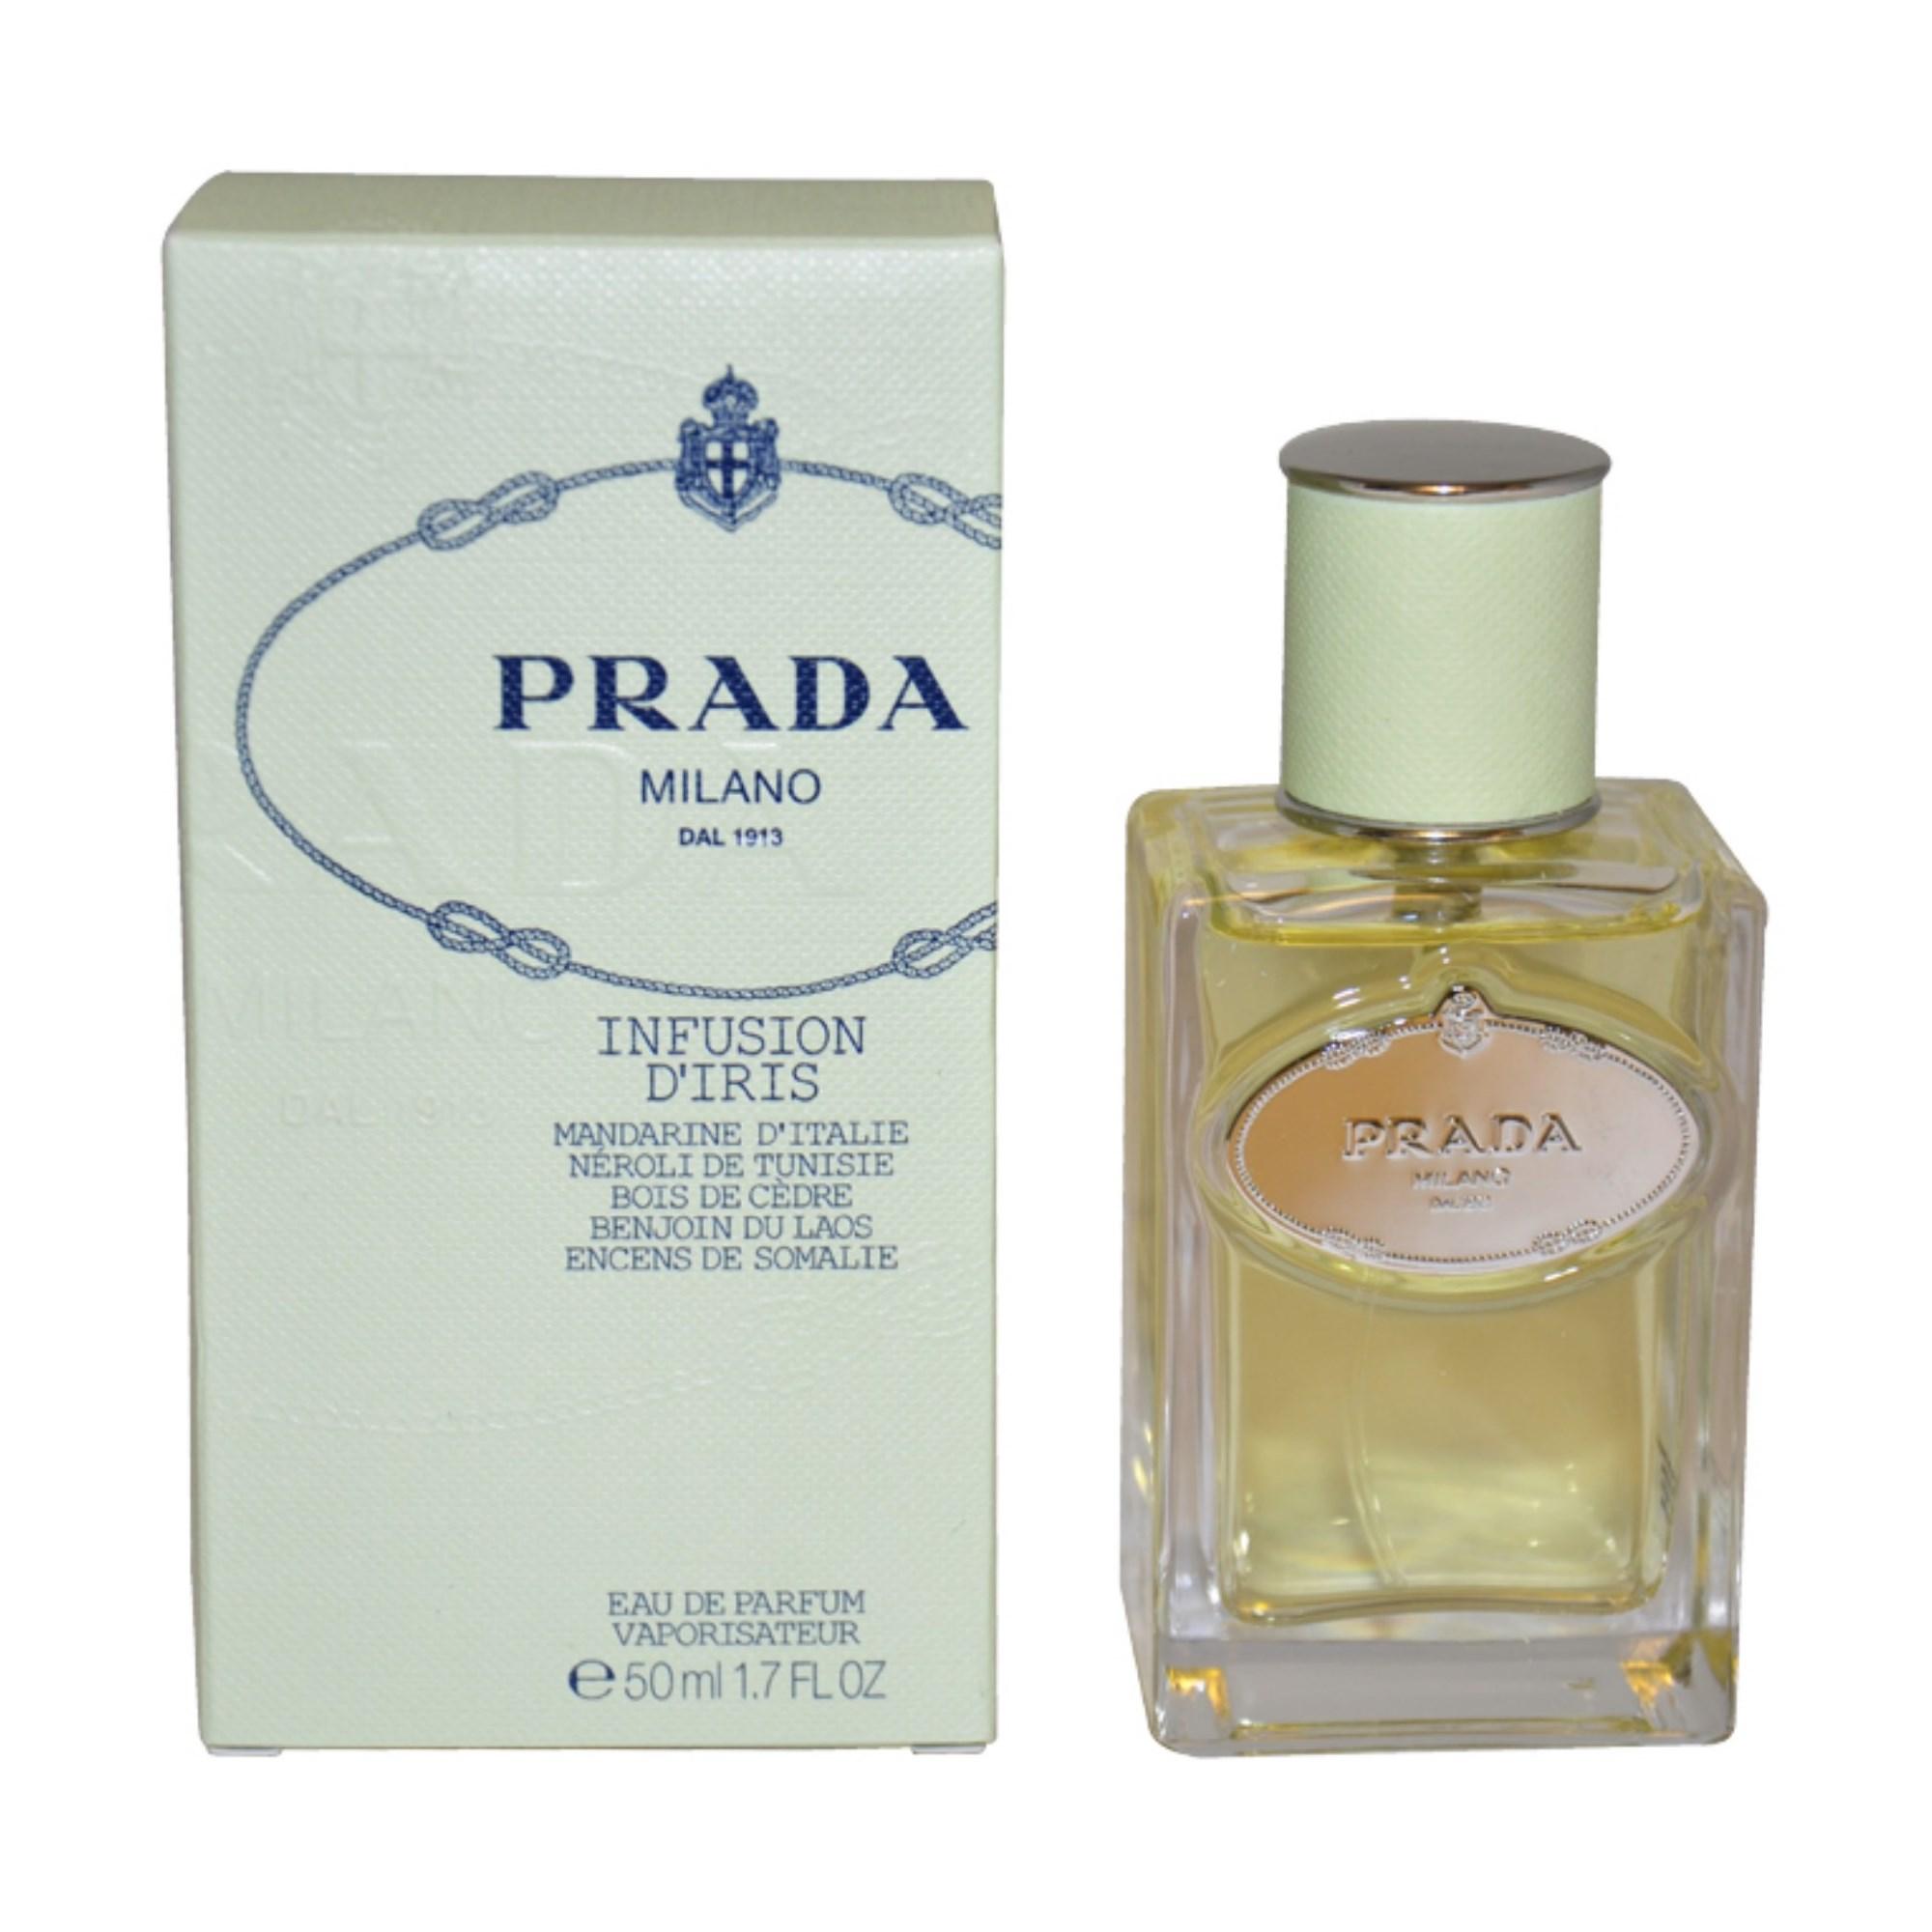 Prada Milano Infusion Diris by Prada for Women - 1.7 oz EDP Spray